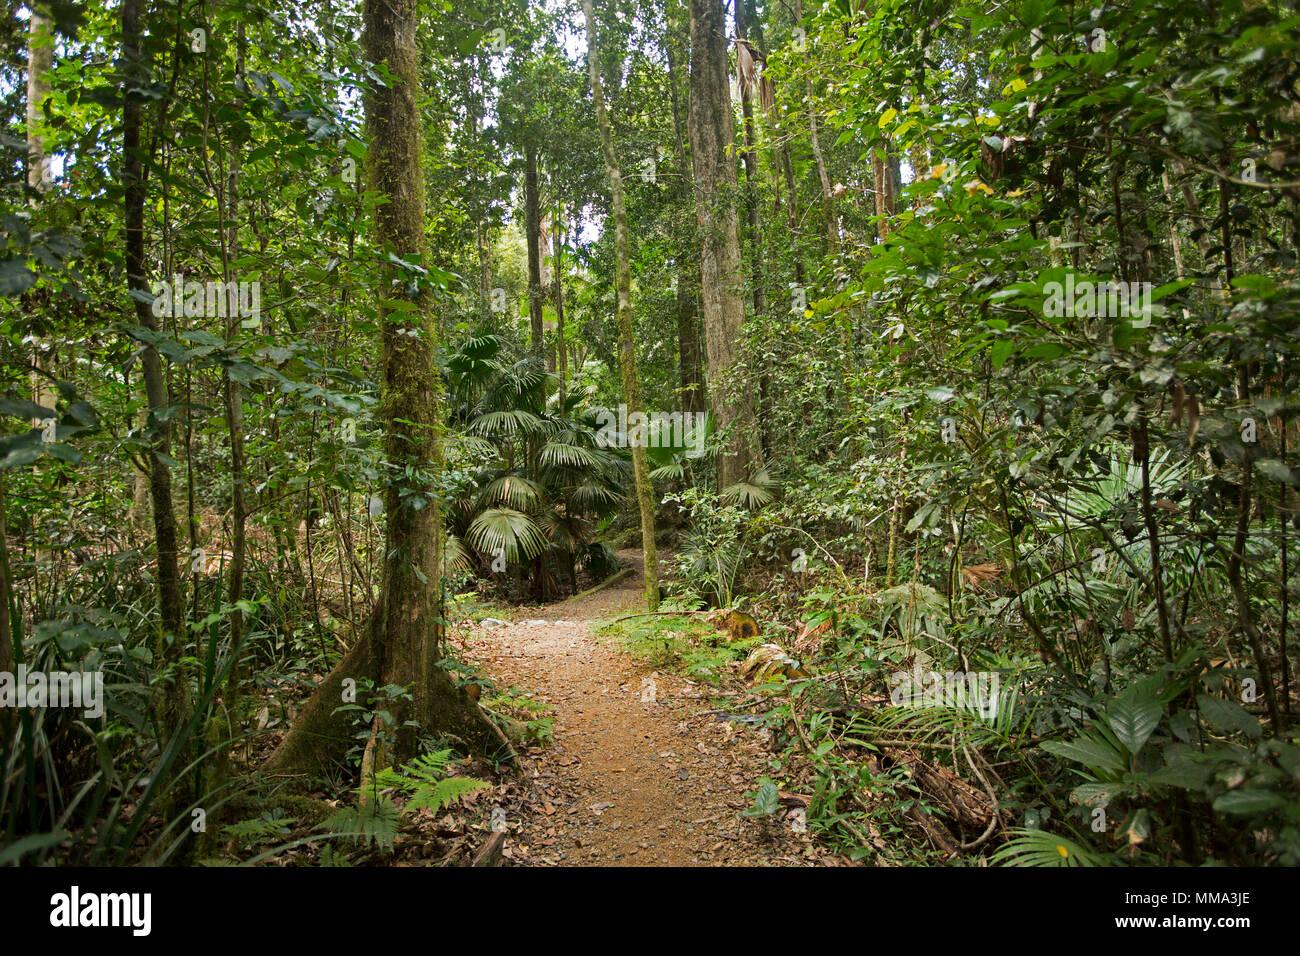 Walking track through dense emerald green vegetation of rainforest in Eungalla National Park Queensland Australia - Stock Image